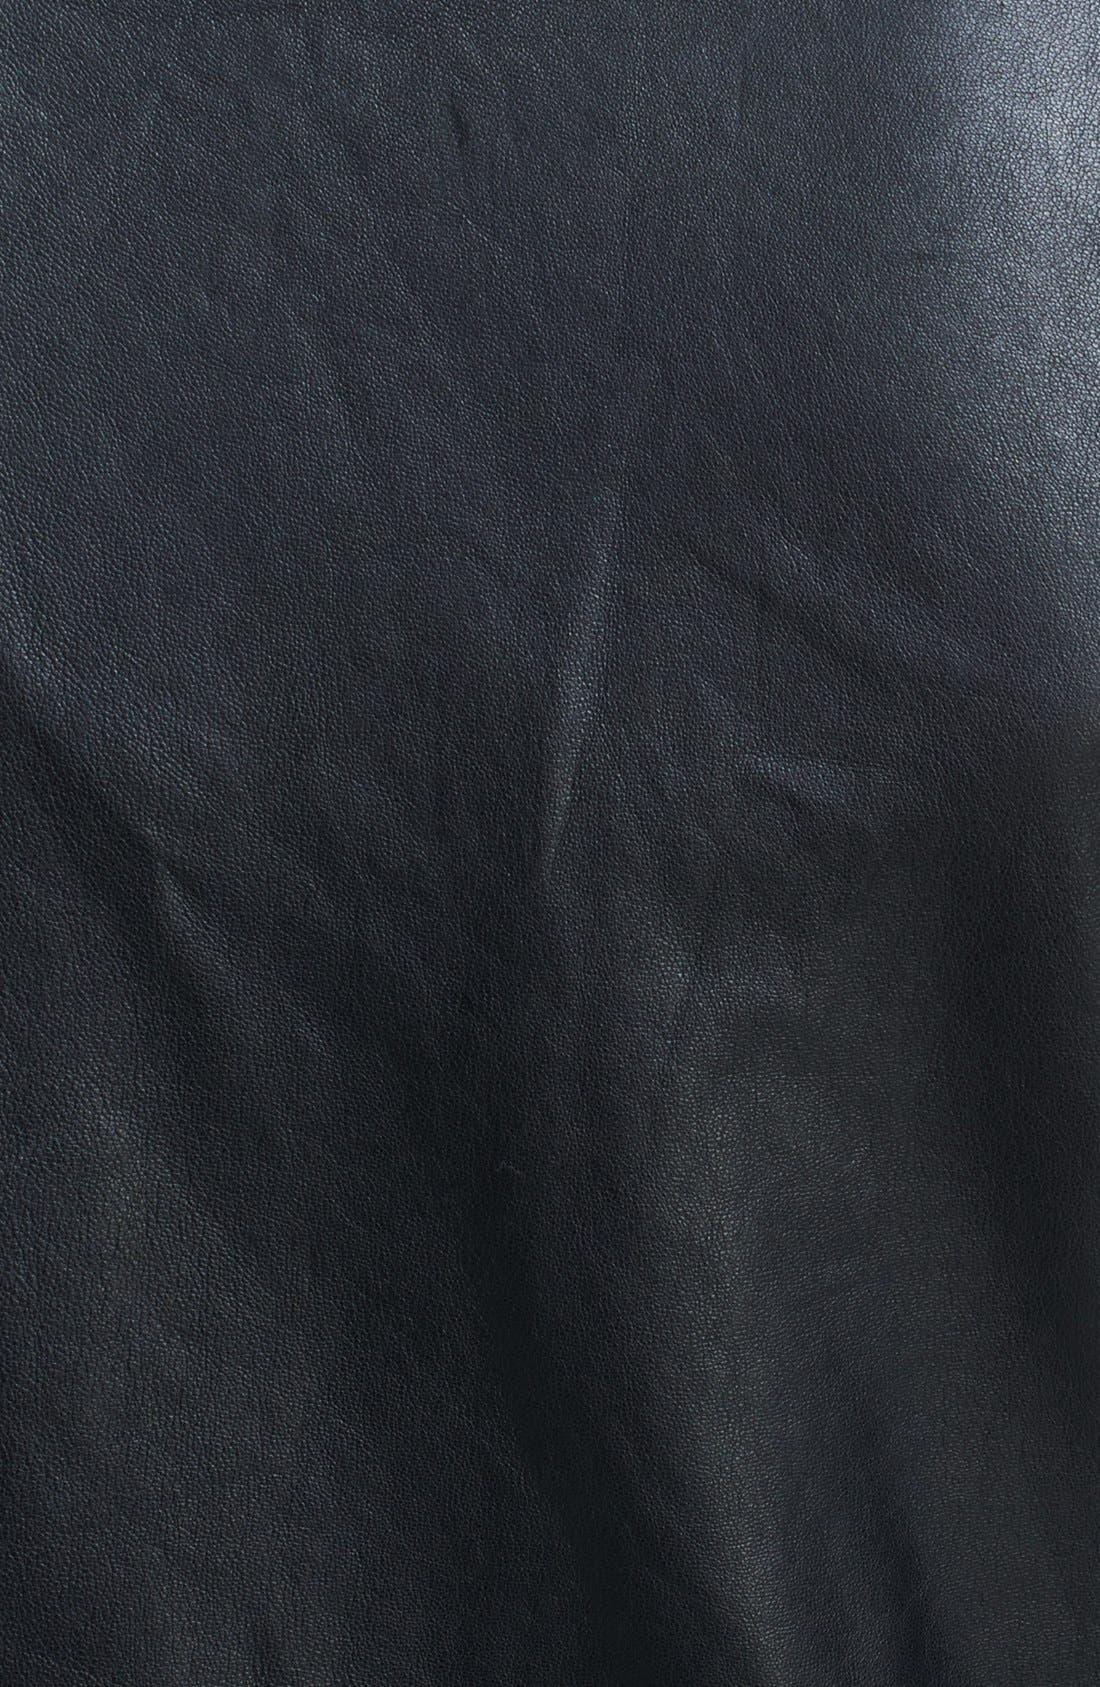 Alternate Image 3  - Roberto Cavalli Fringe Detail Leather Jacket